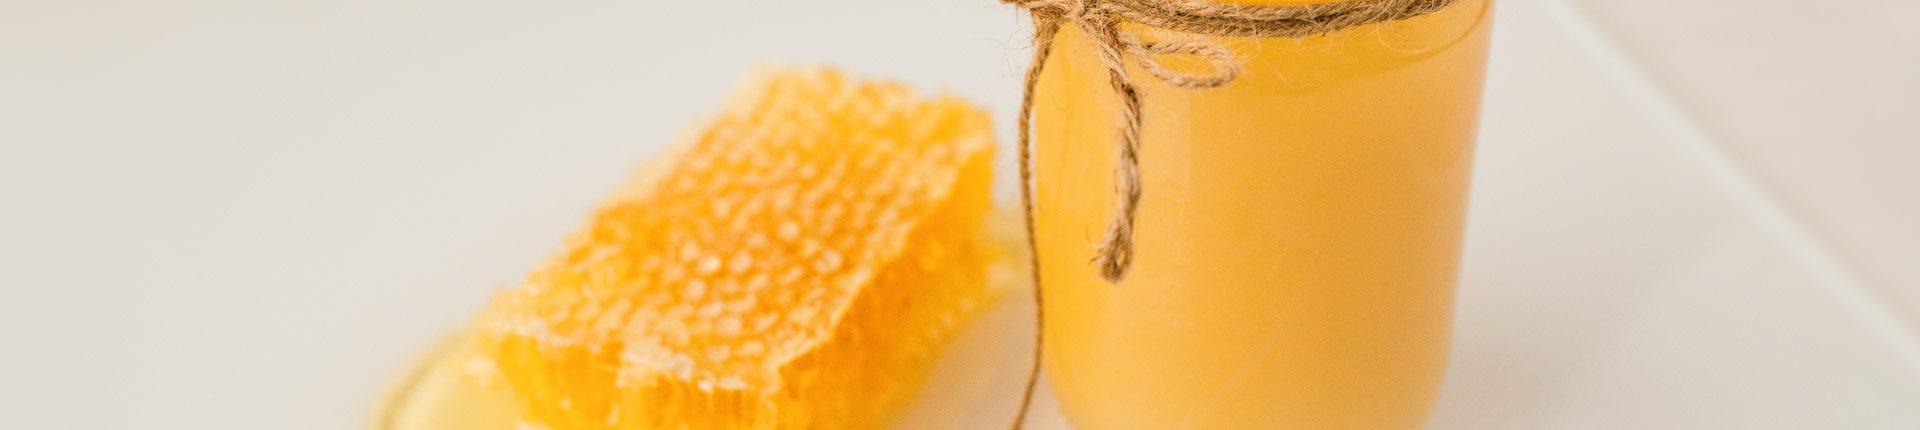 Miód kremowany - bez dodatku cukru